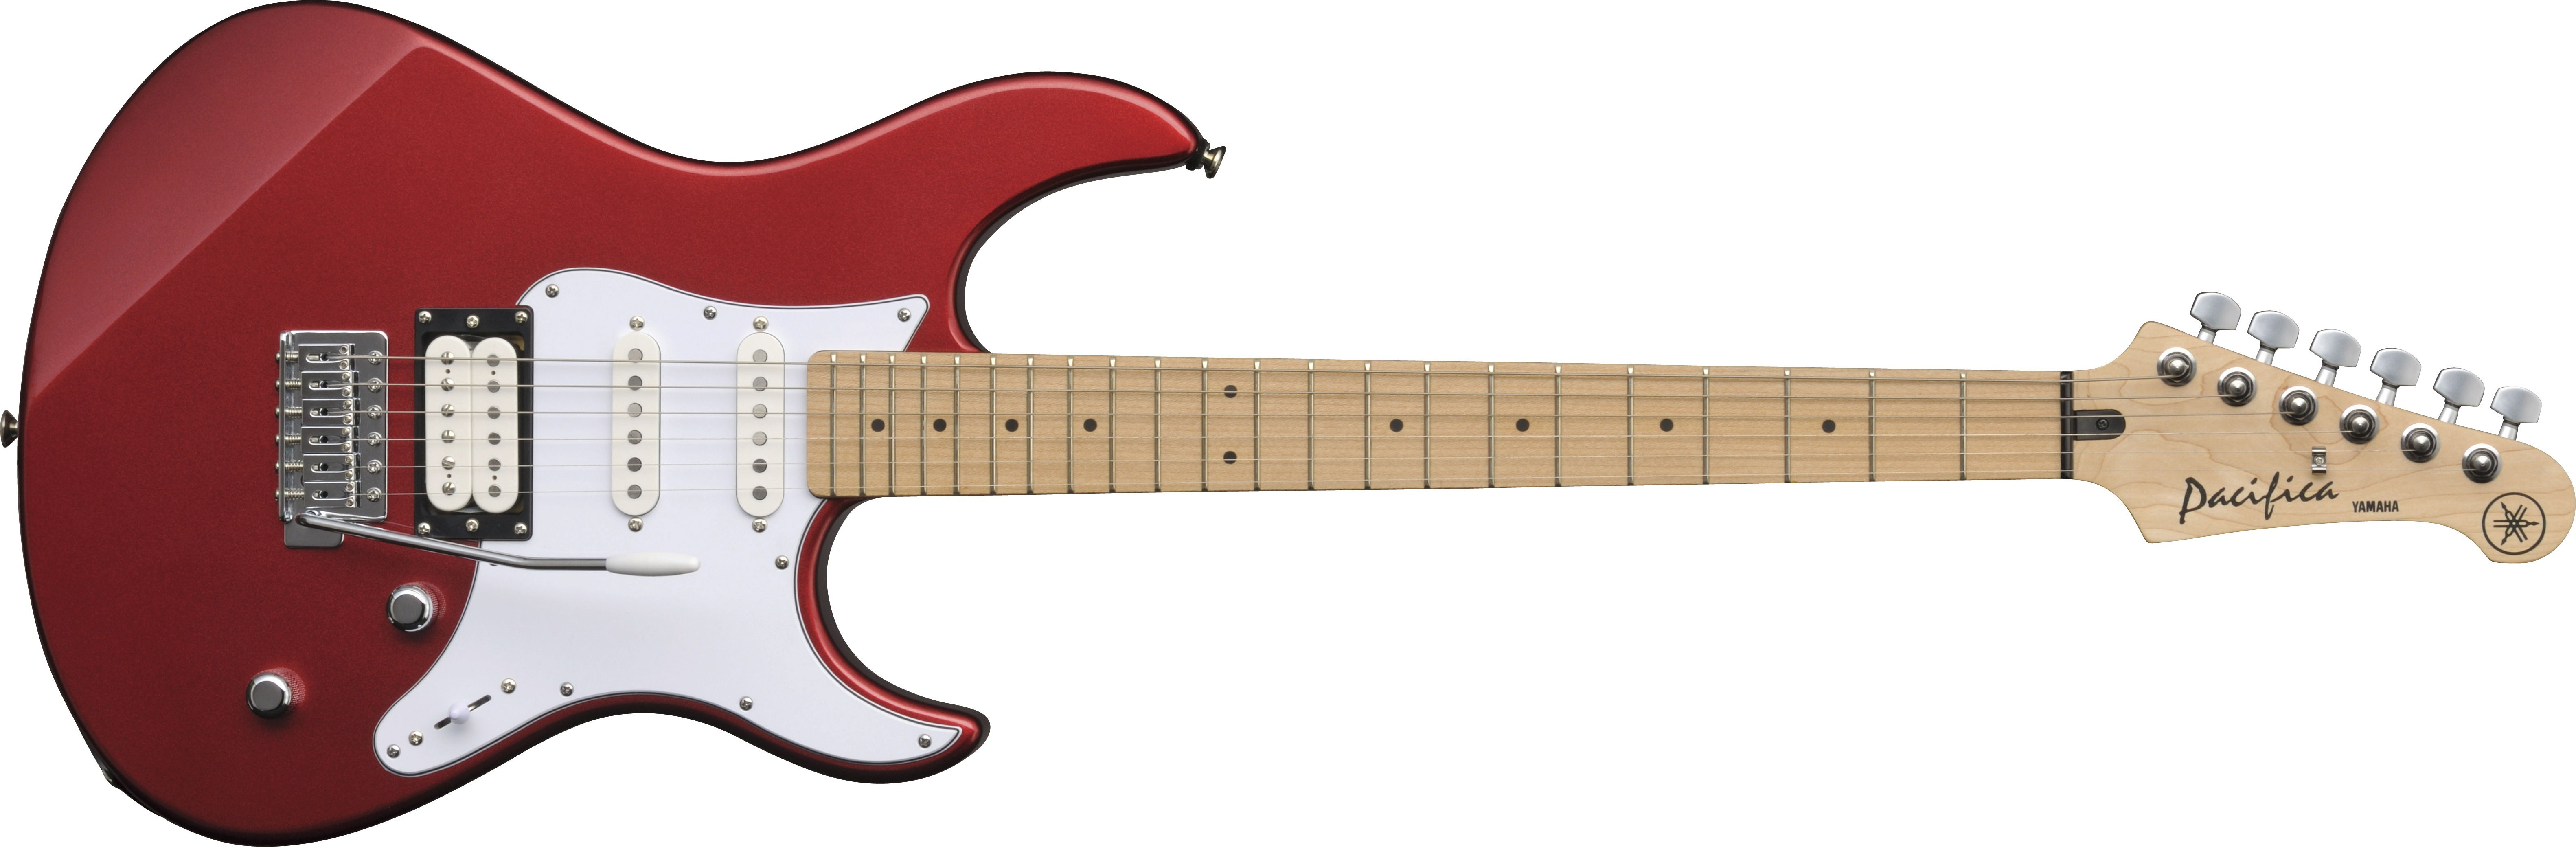 Guitare électrique Yamaha Pacifica PA112VM Red Metallic